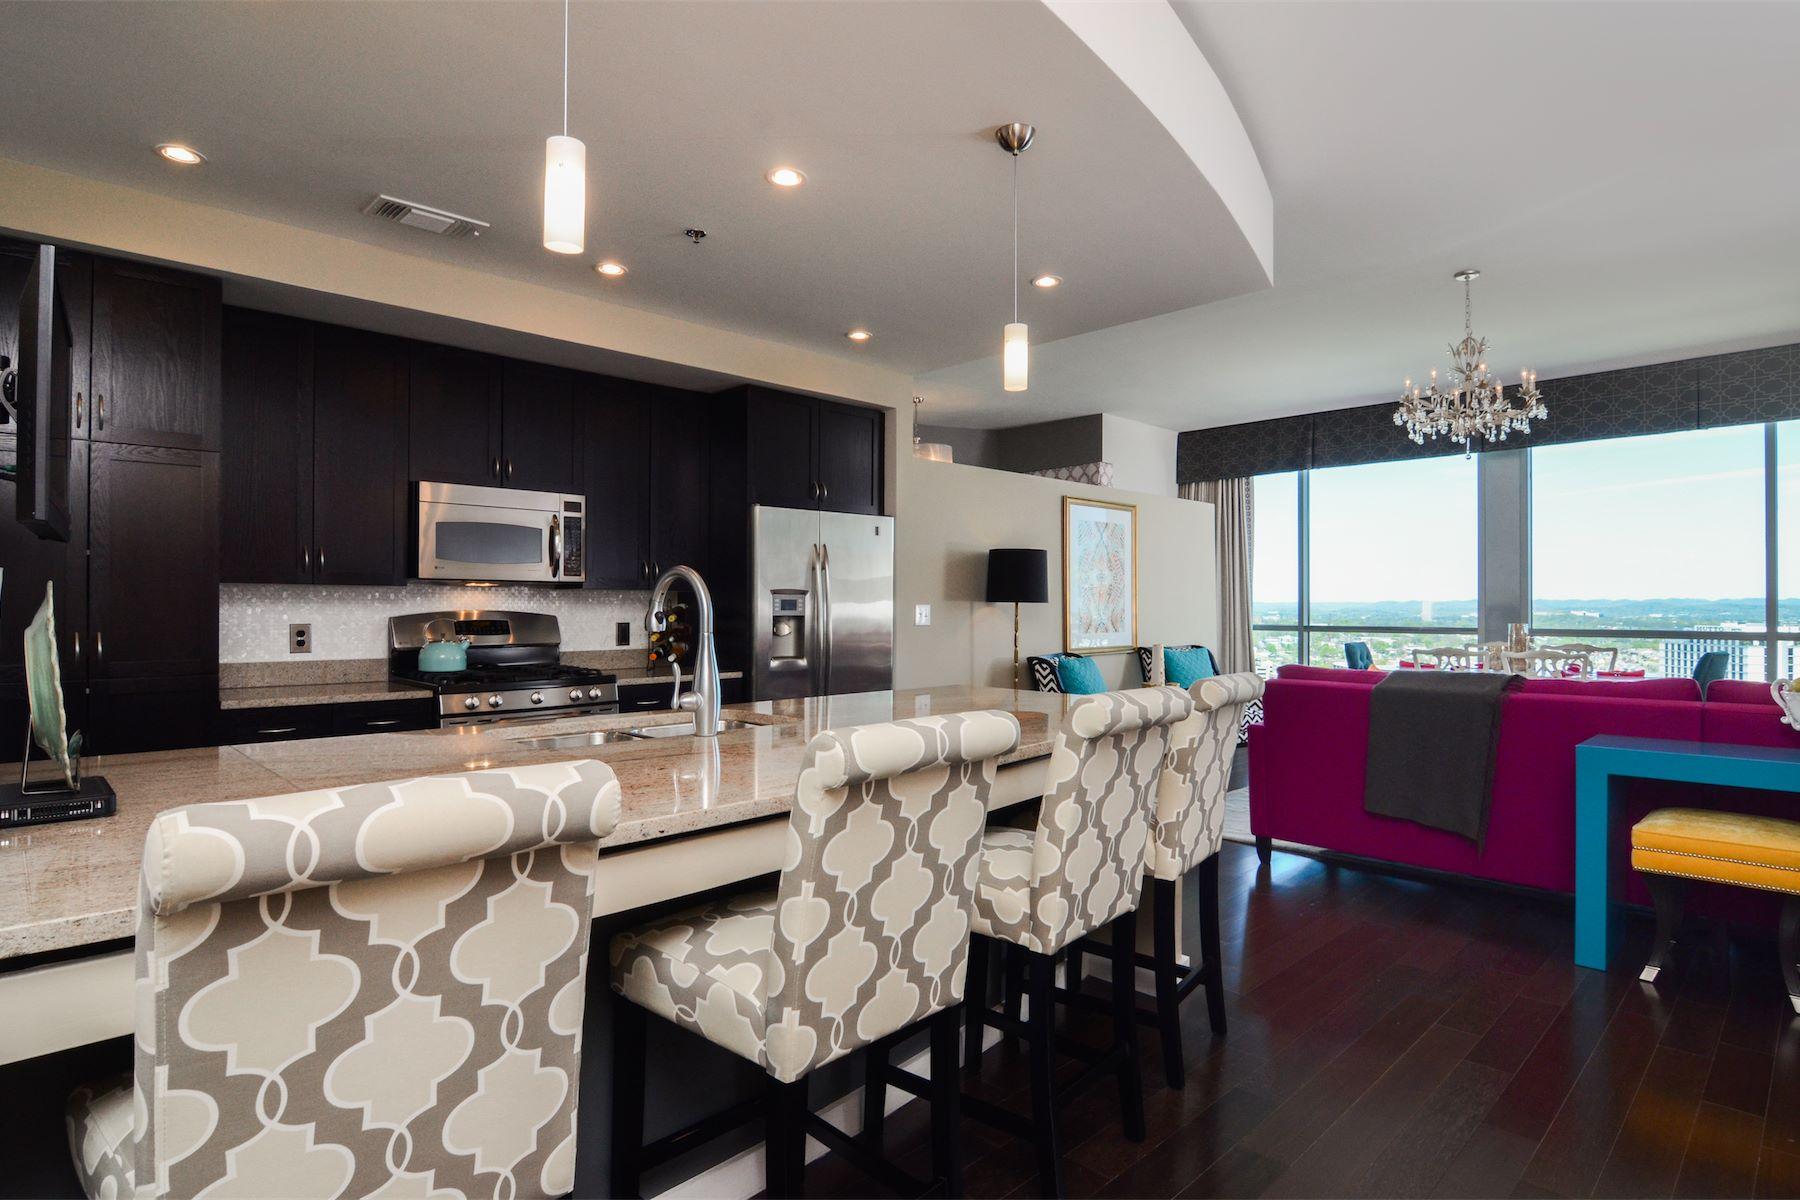 Condominium for Sale at Stunning Adelicia Condo 900 20th Avenue South Apartment 1509 Nashville, Tennessee, 37212 United States